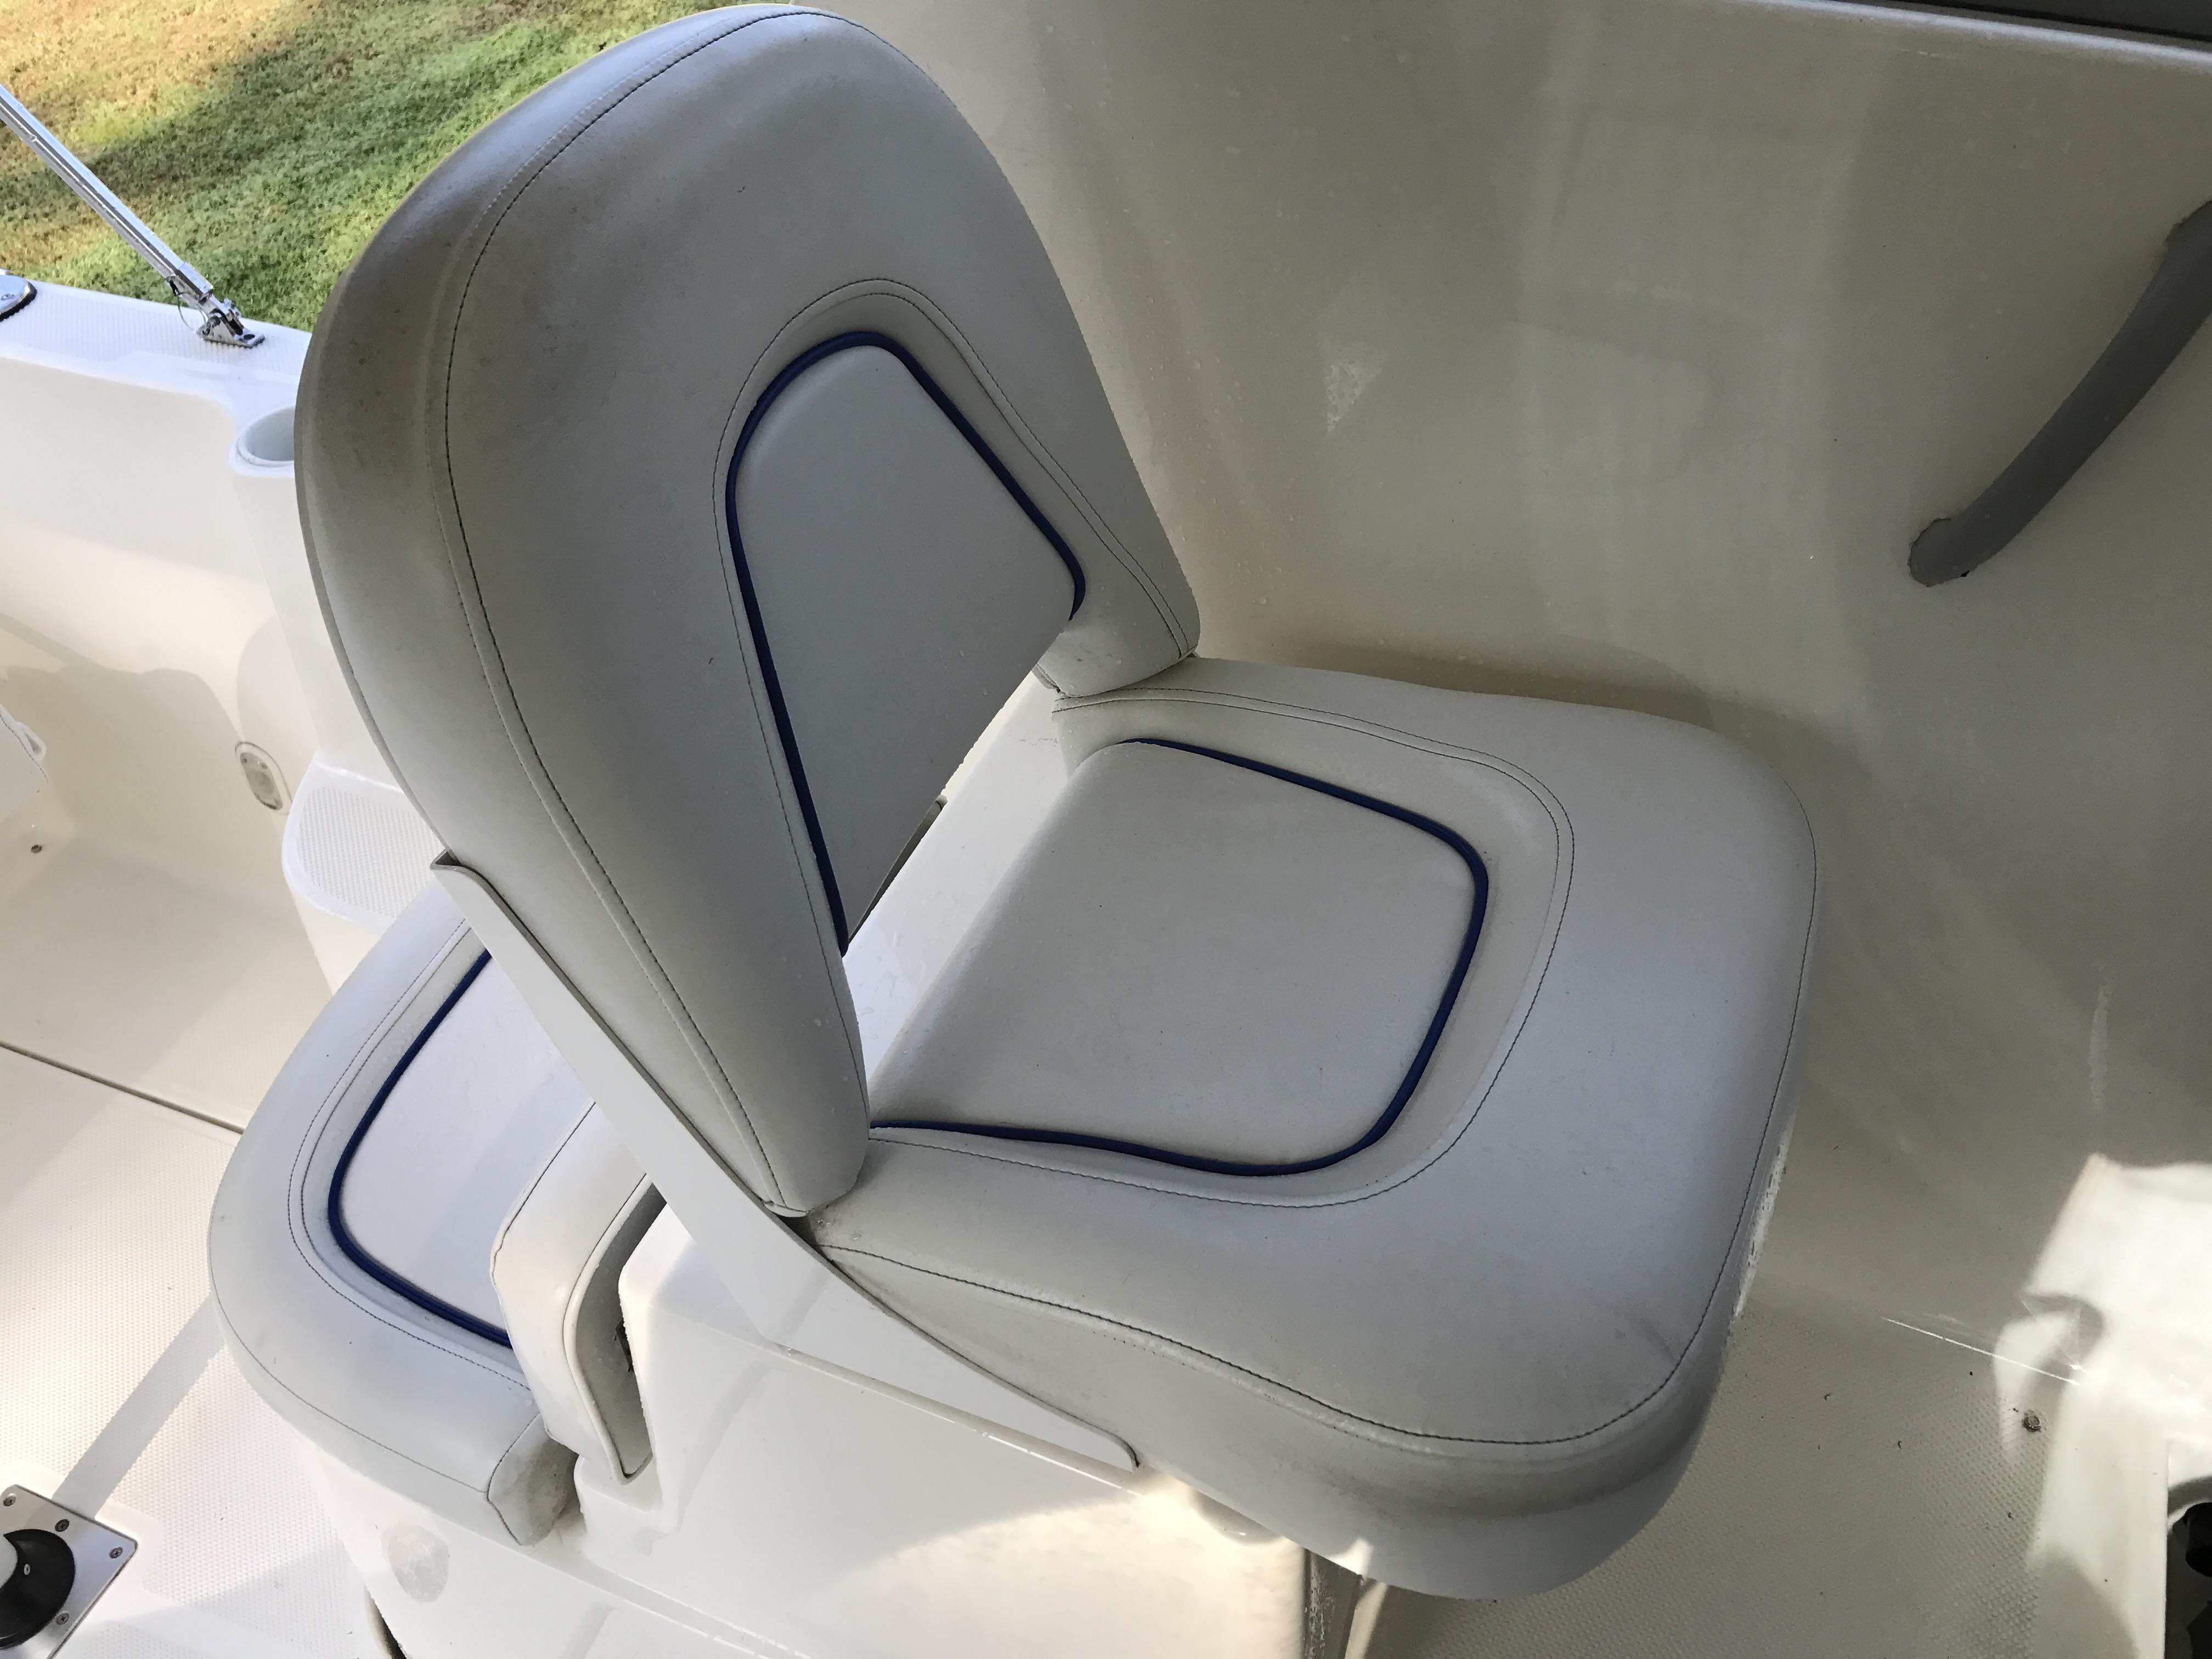 Bayliner Discovery 246 EC - port helm seating